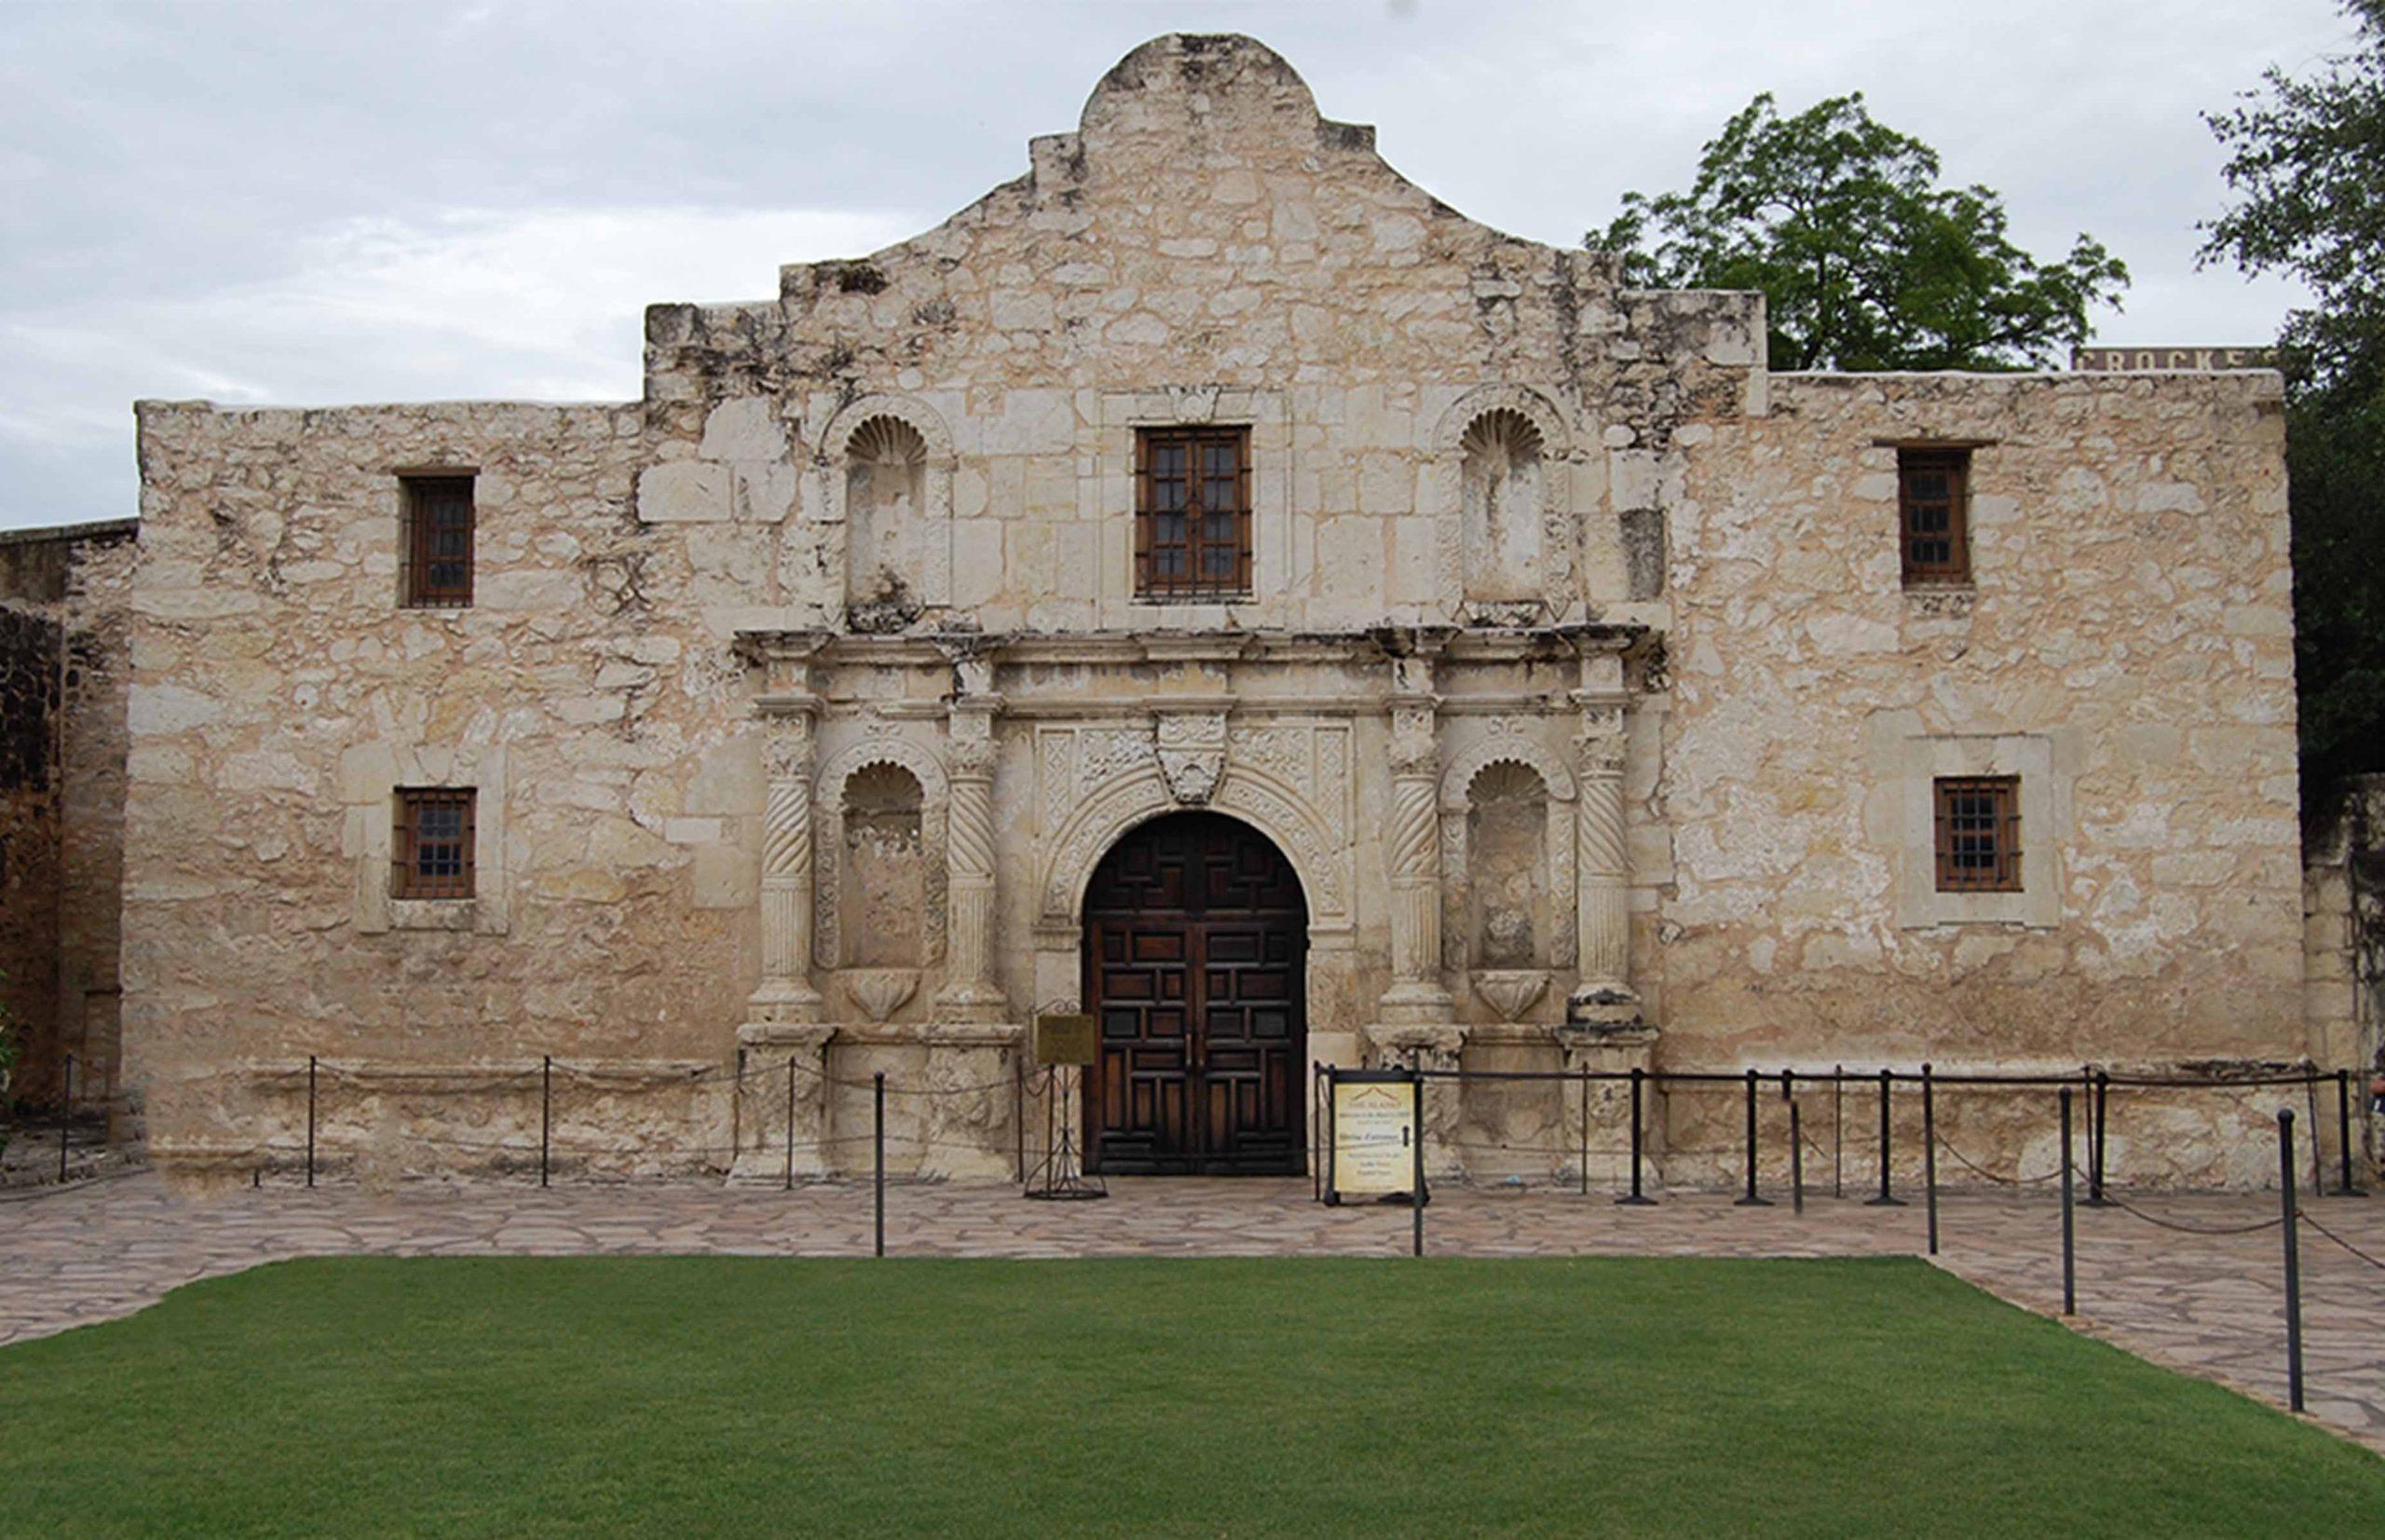 Spring Break Destinations in Texas